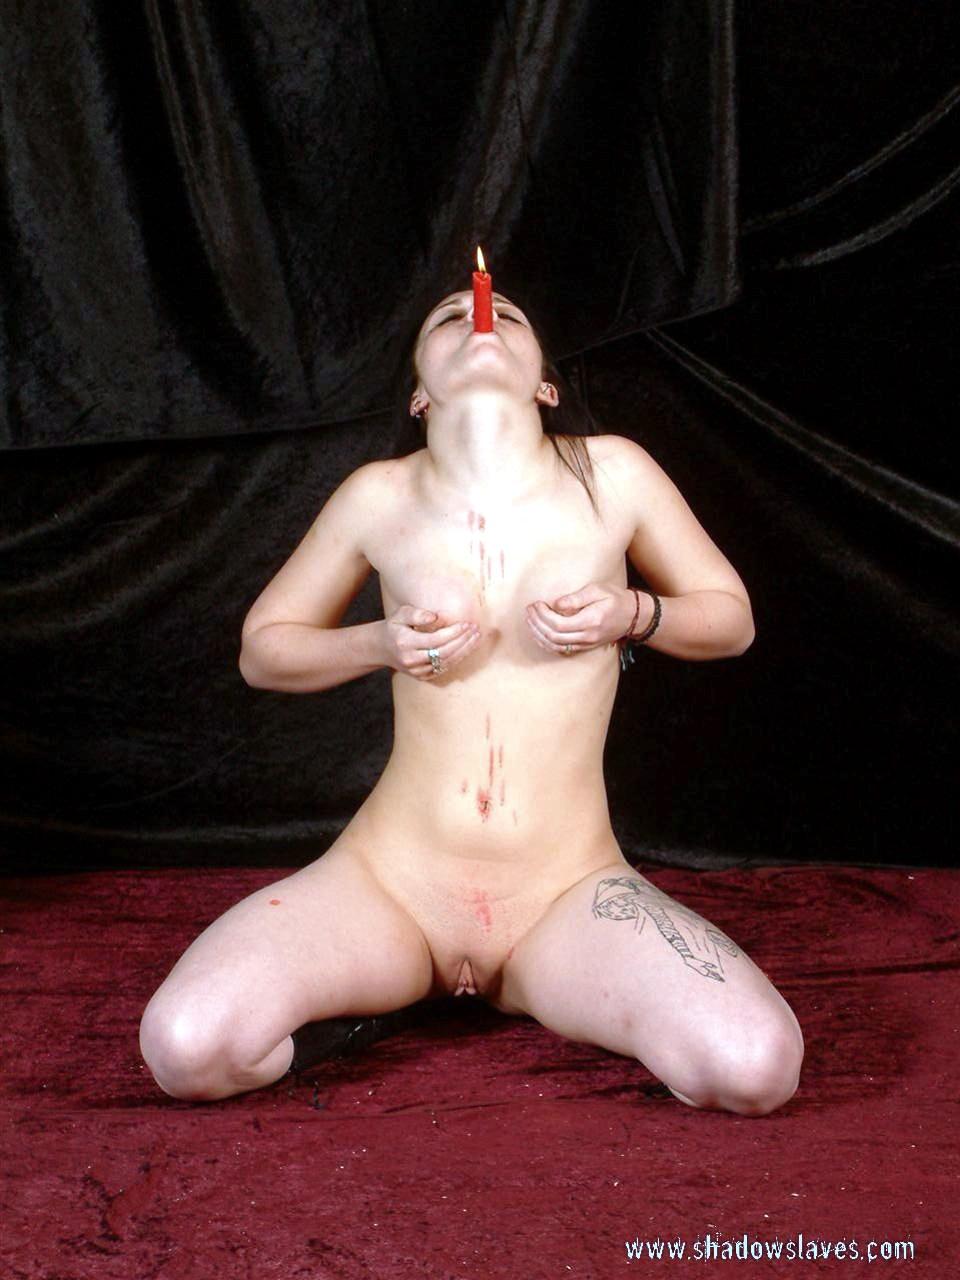 fucky guy sex girl hot hd